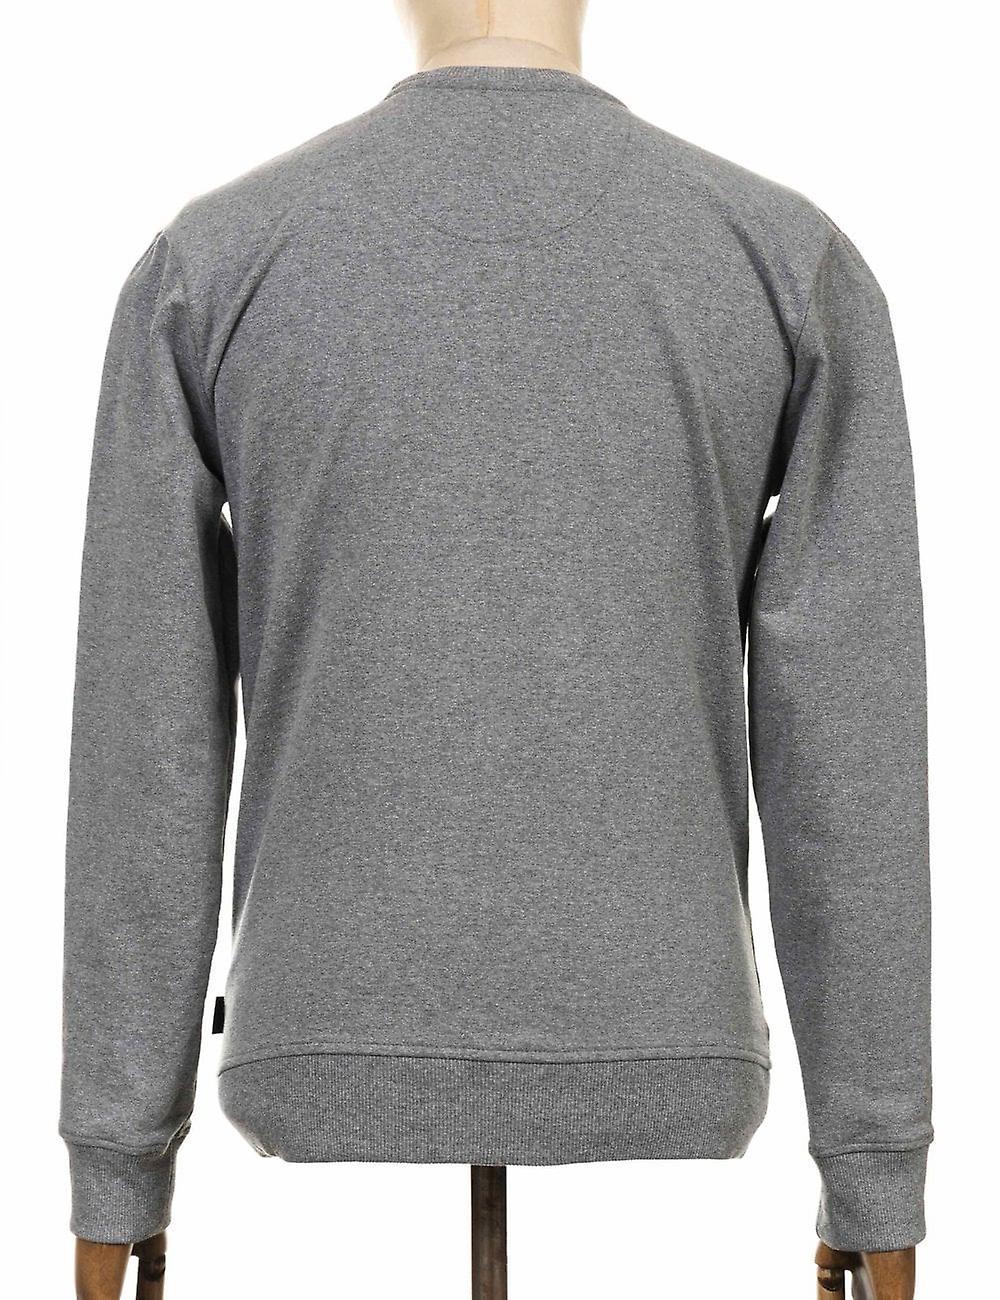 Patagonia P-6 Label Uprisal Crew Sweatshirt - Gravel Heather